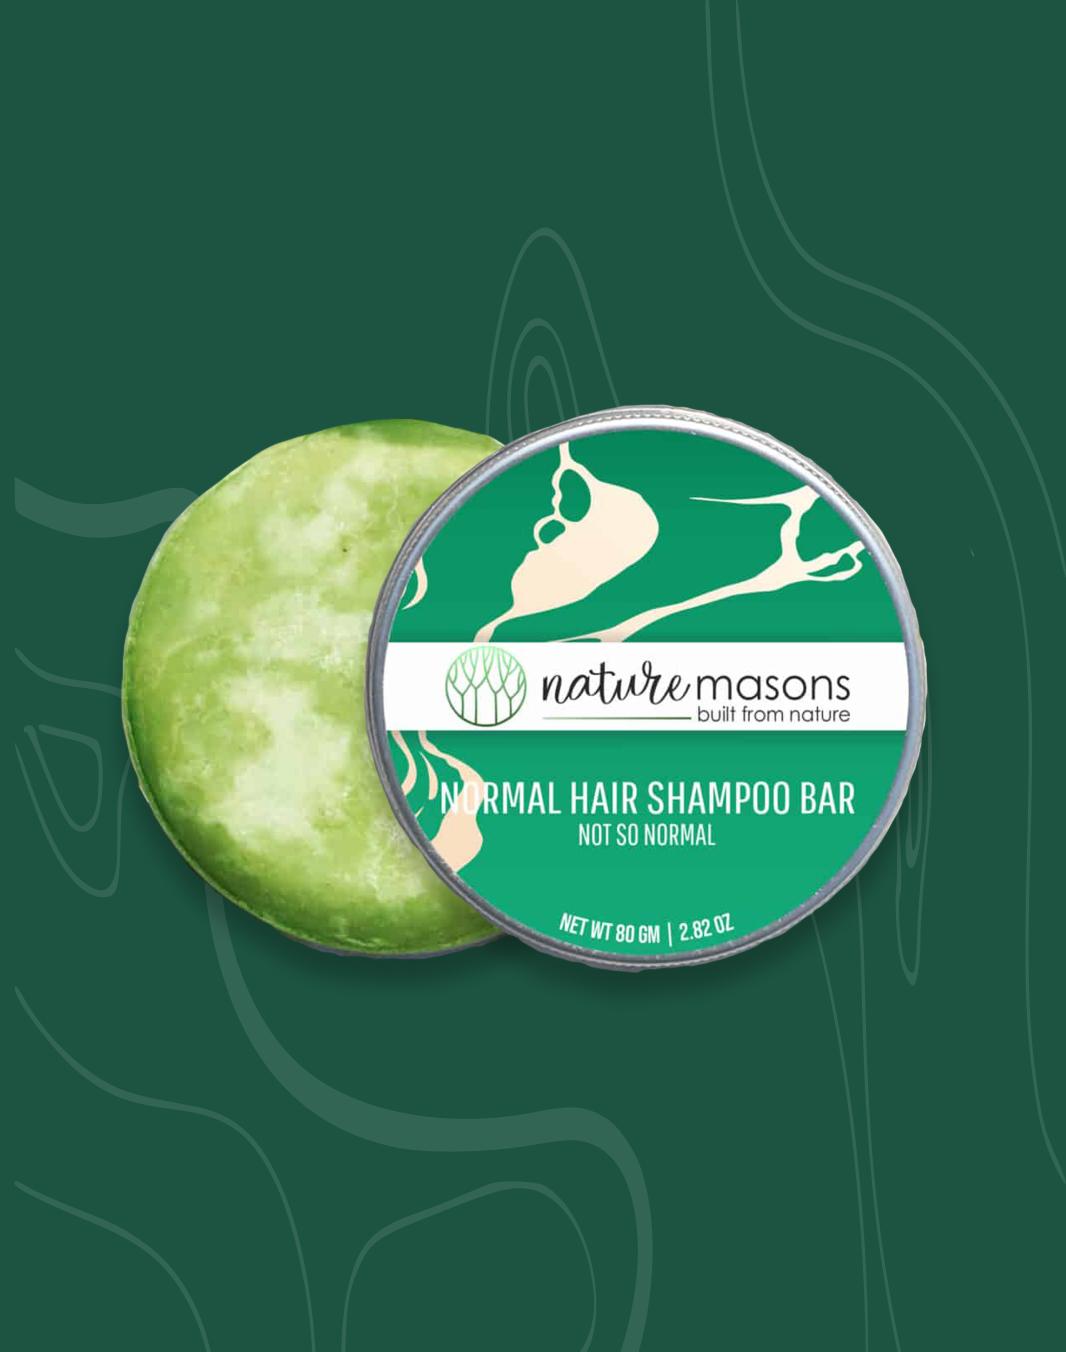 Natural shampoo bar